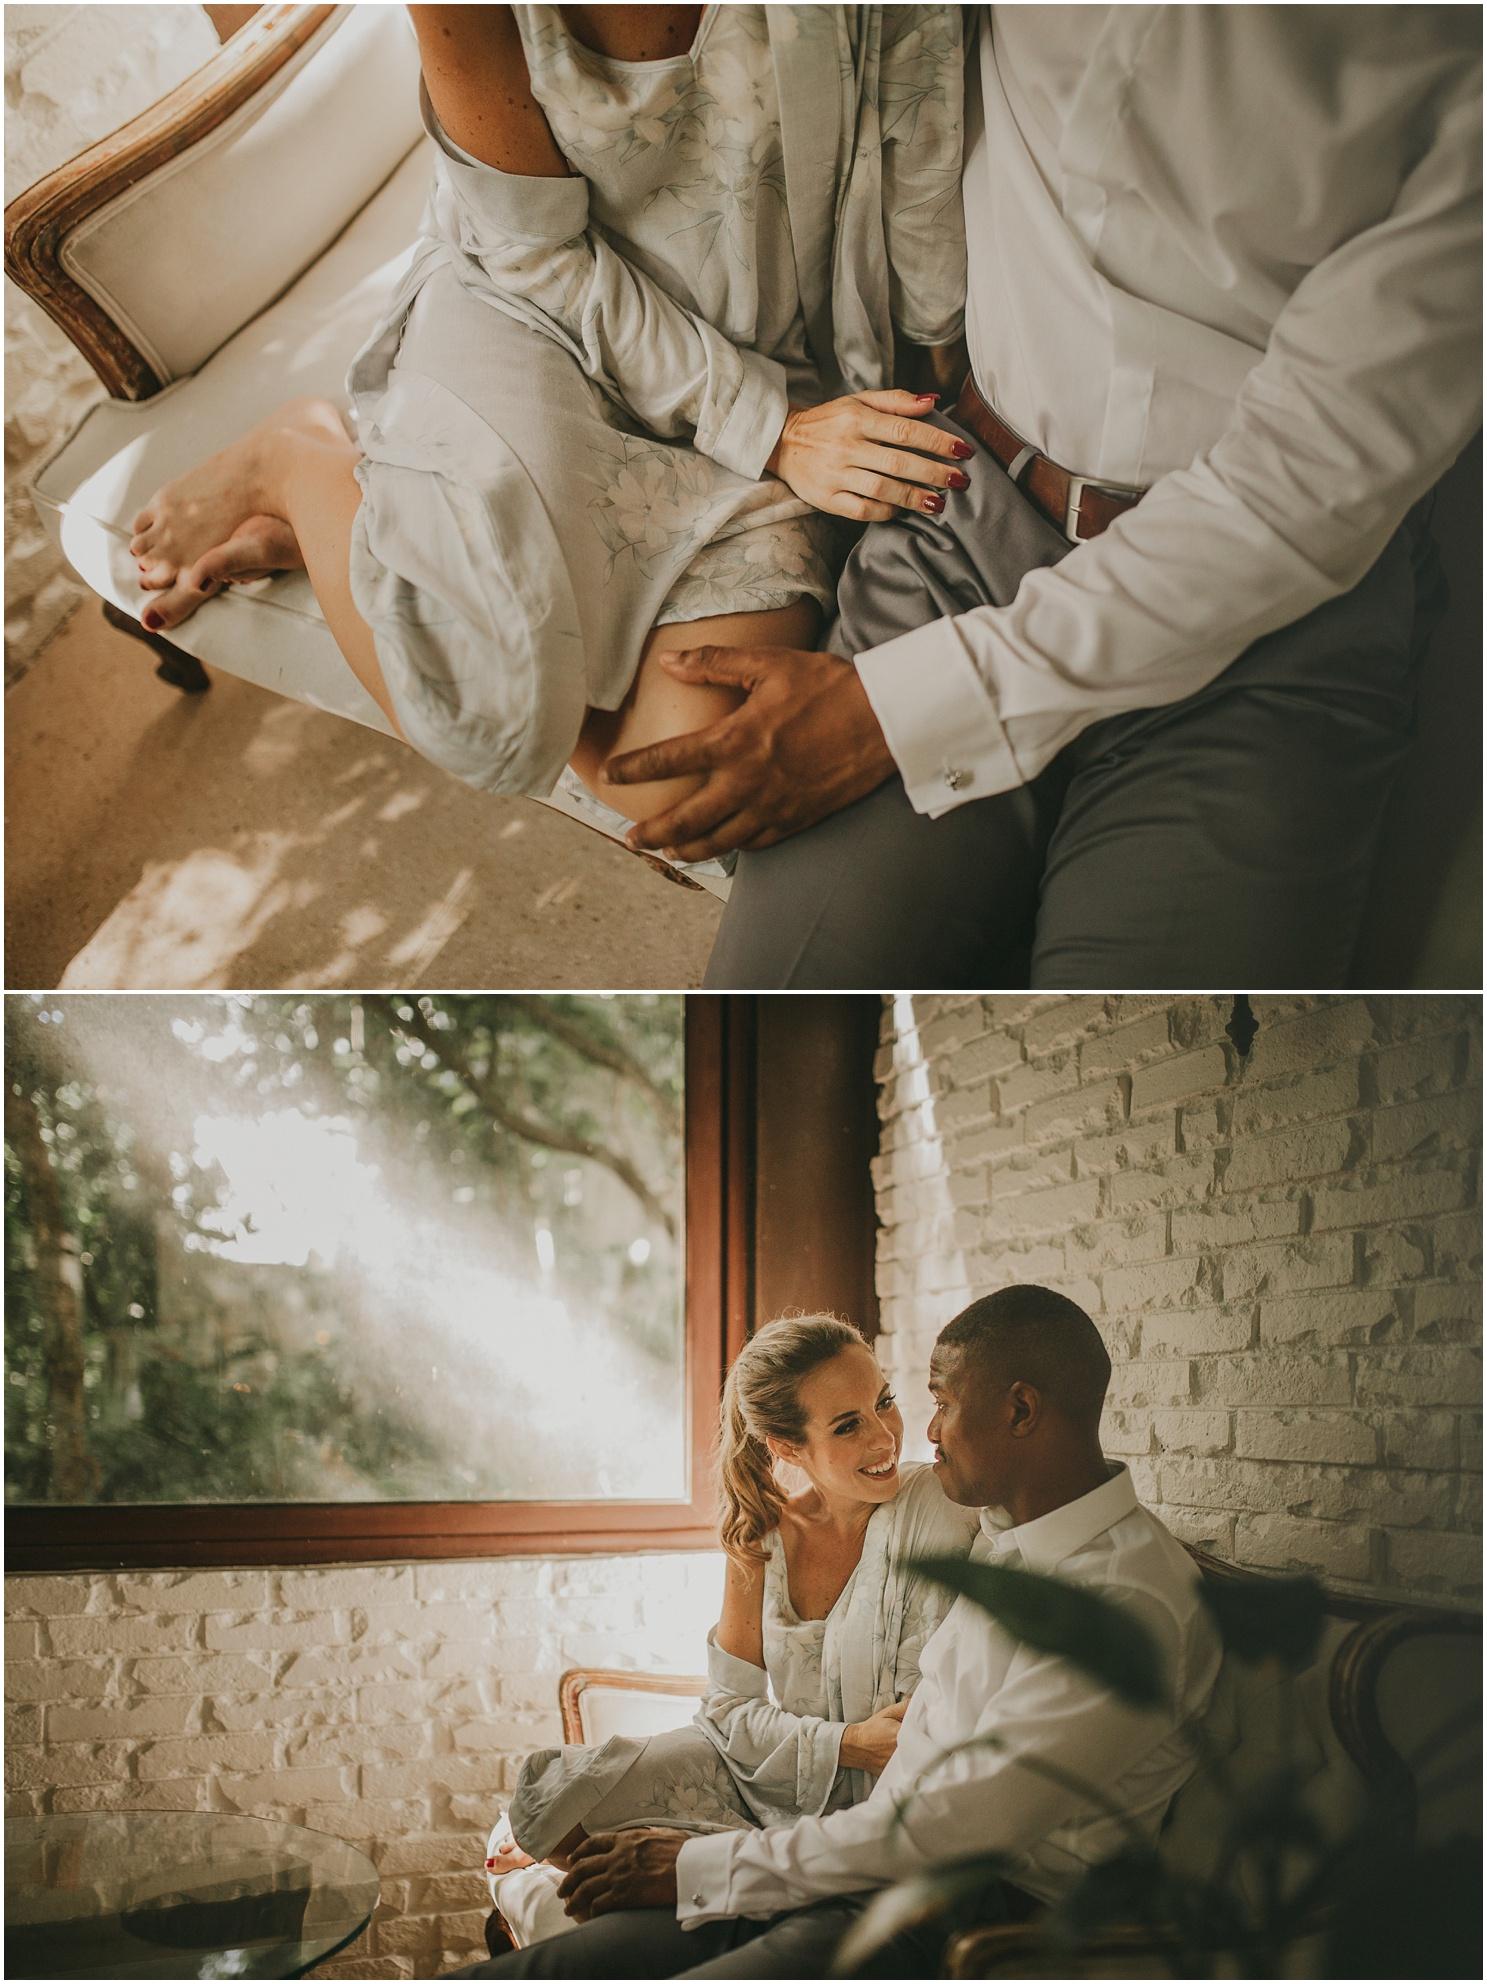 Pablo Laguia wedding photographer 031.jpg